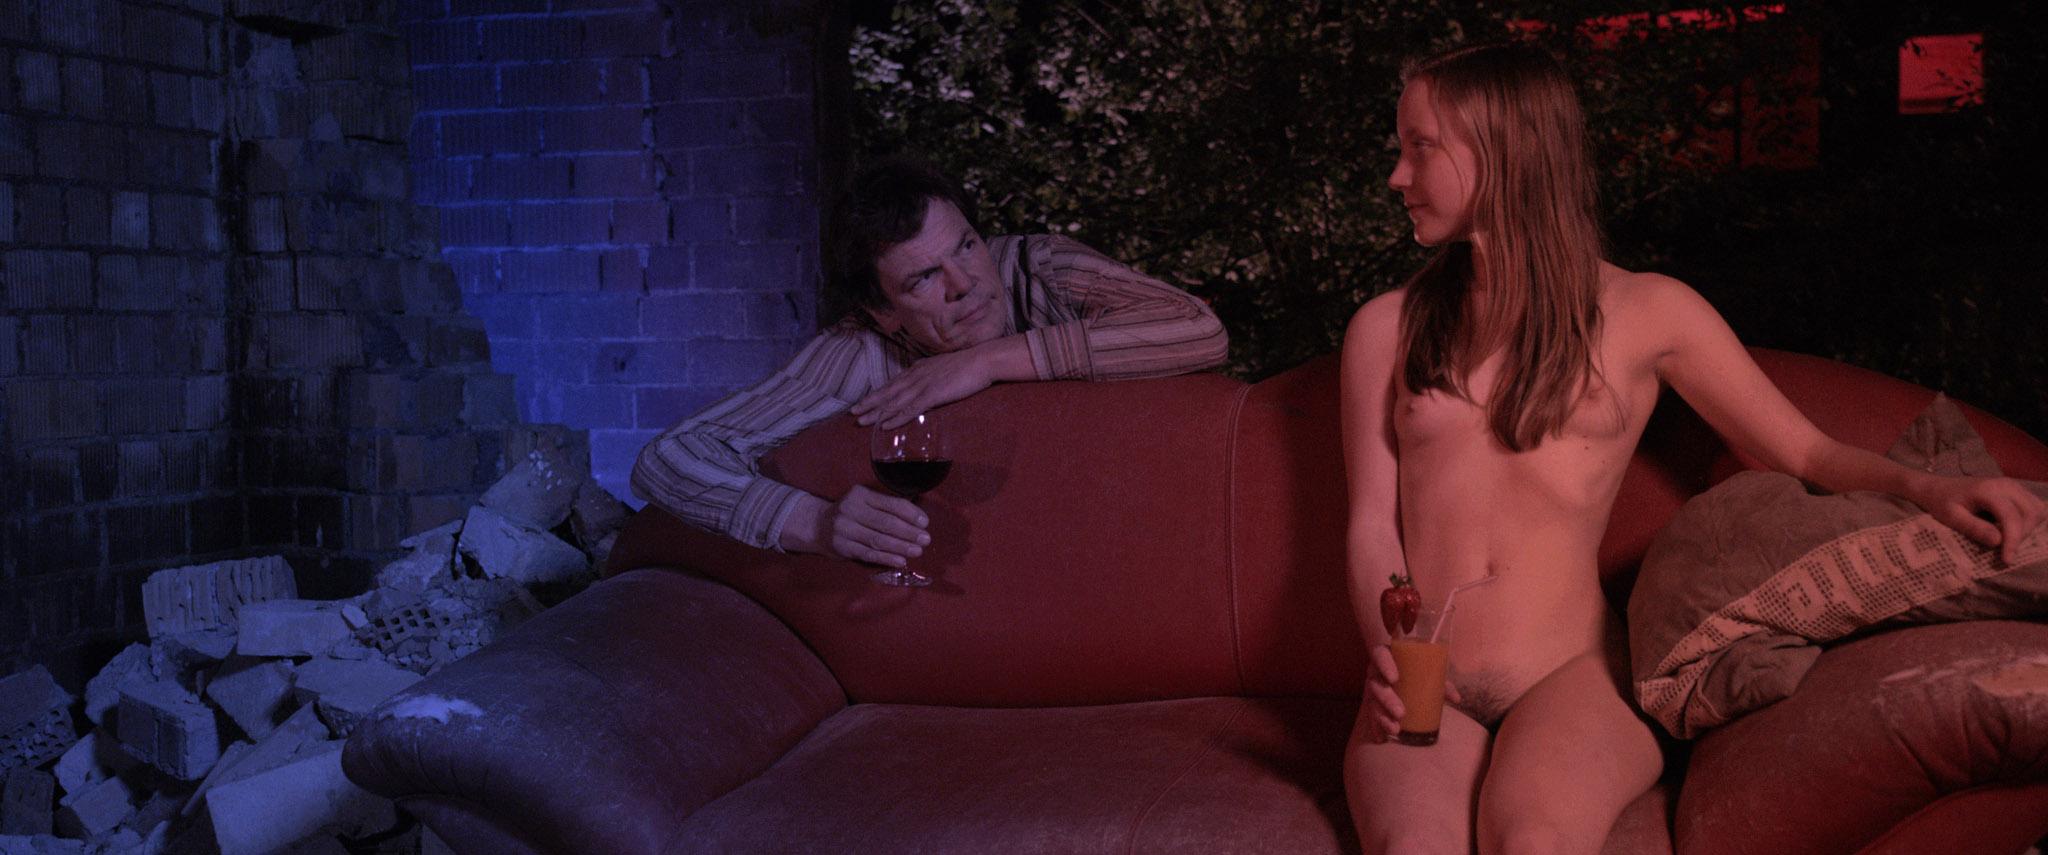 German Cinema Porn Videos Free Sex  xHamster